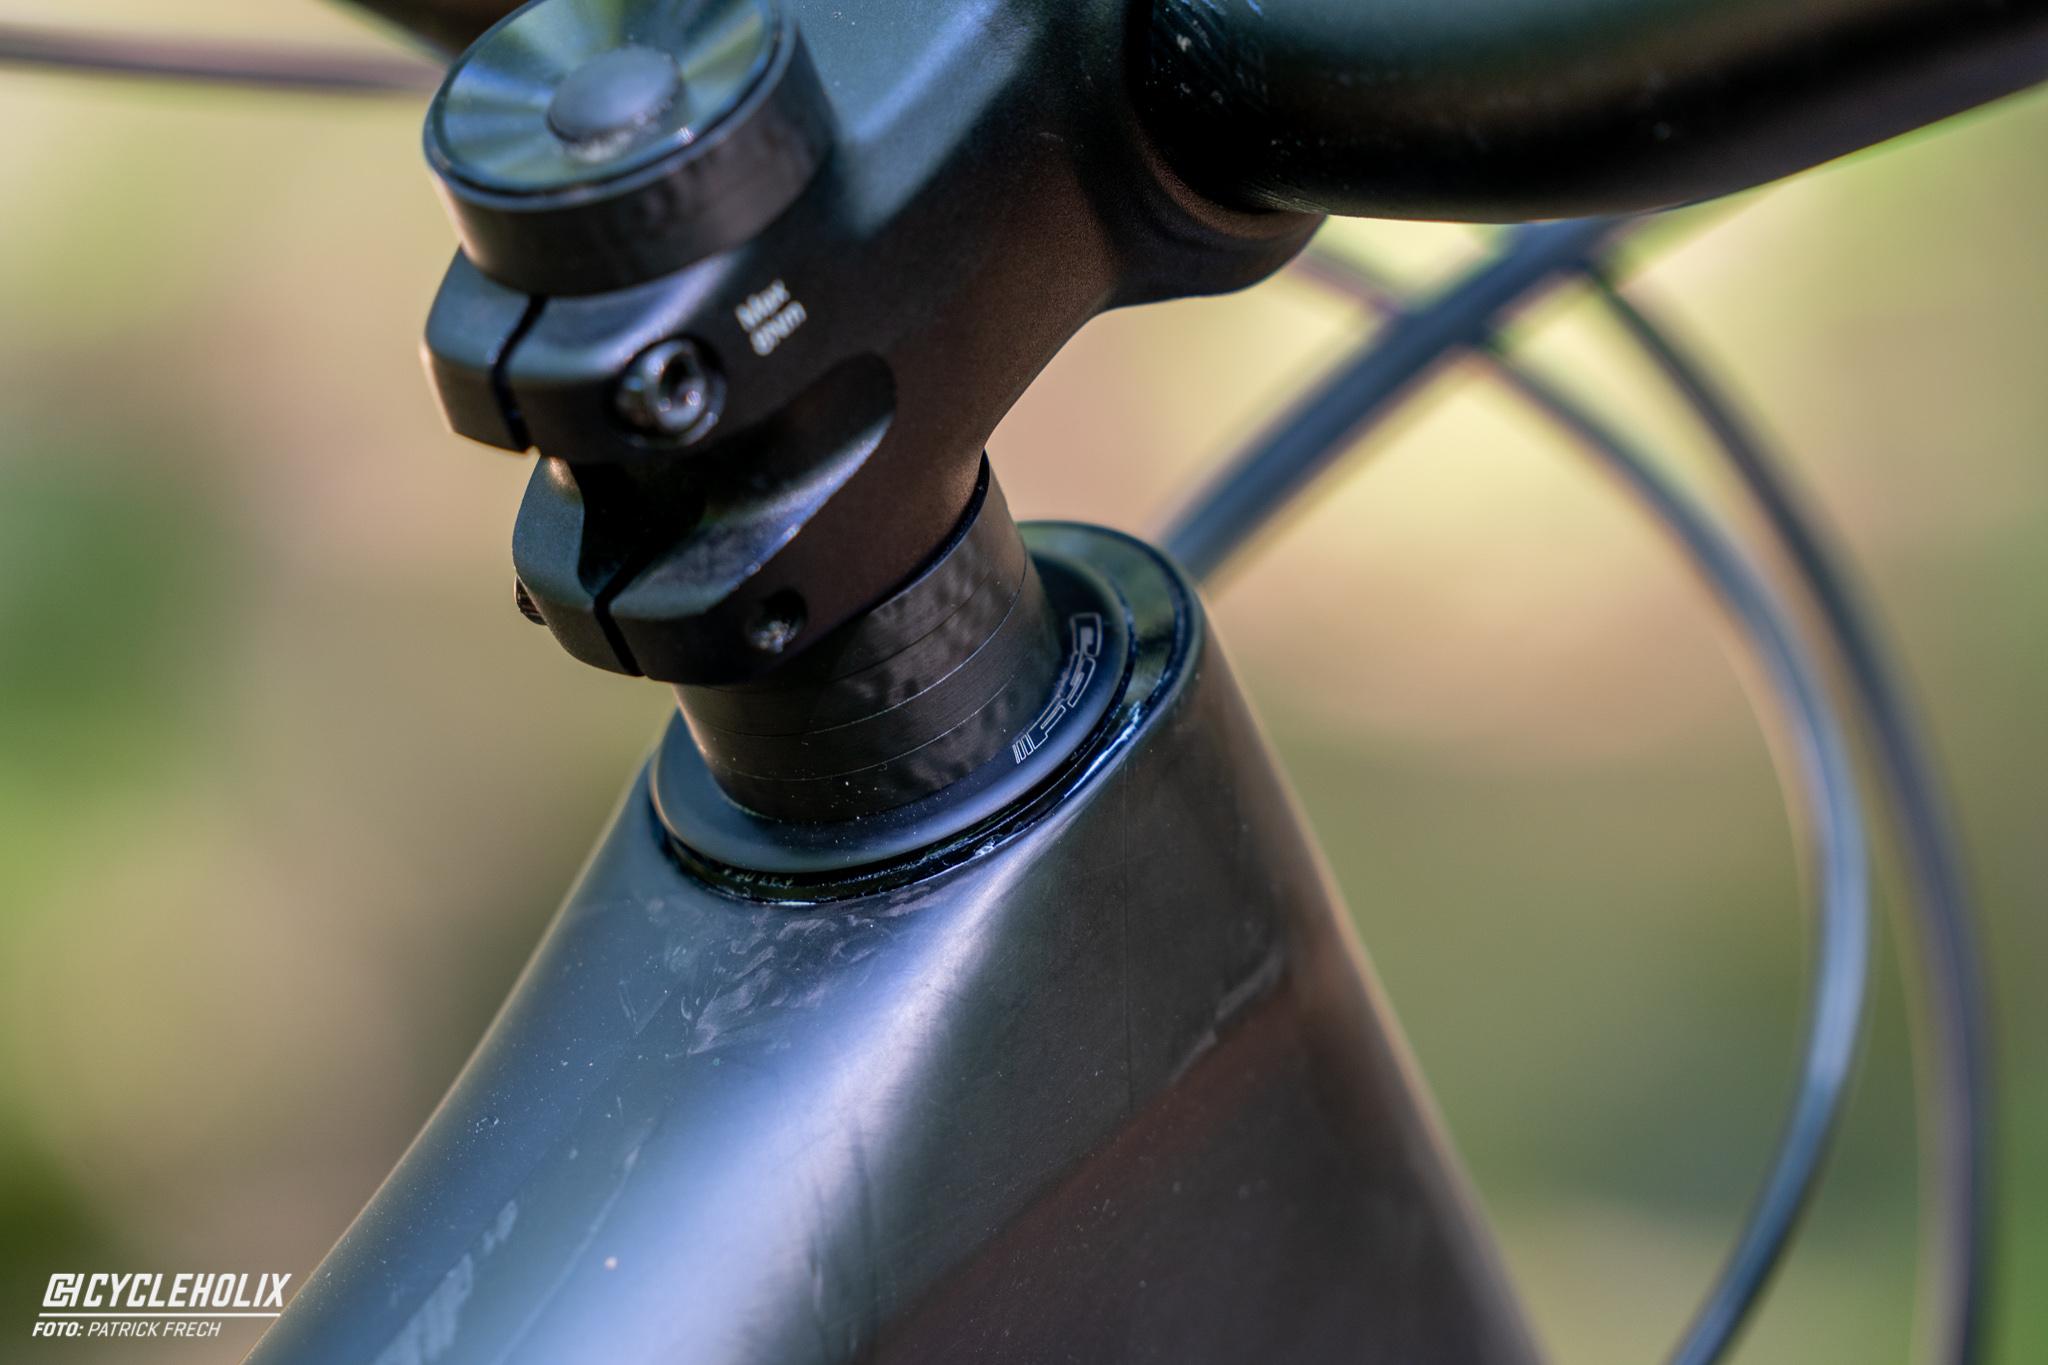 specialized stumpjumper evo 2021 prod 9 Cycleholix